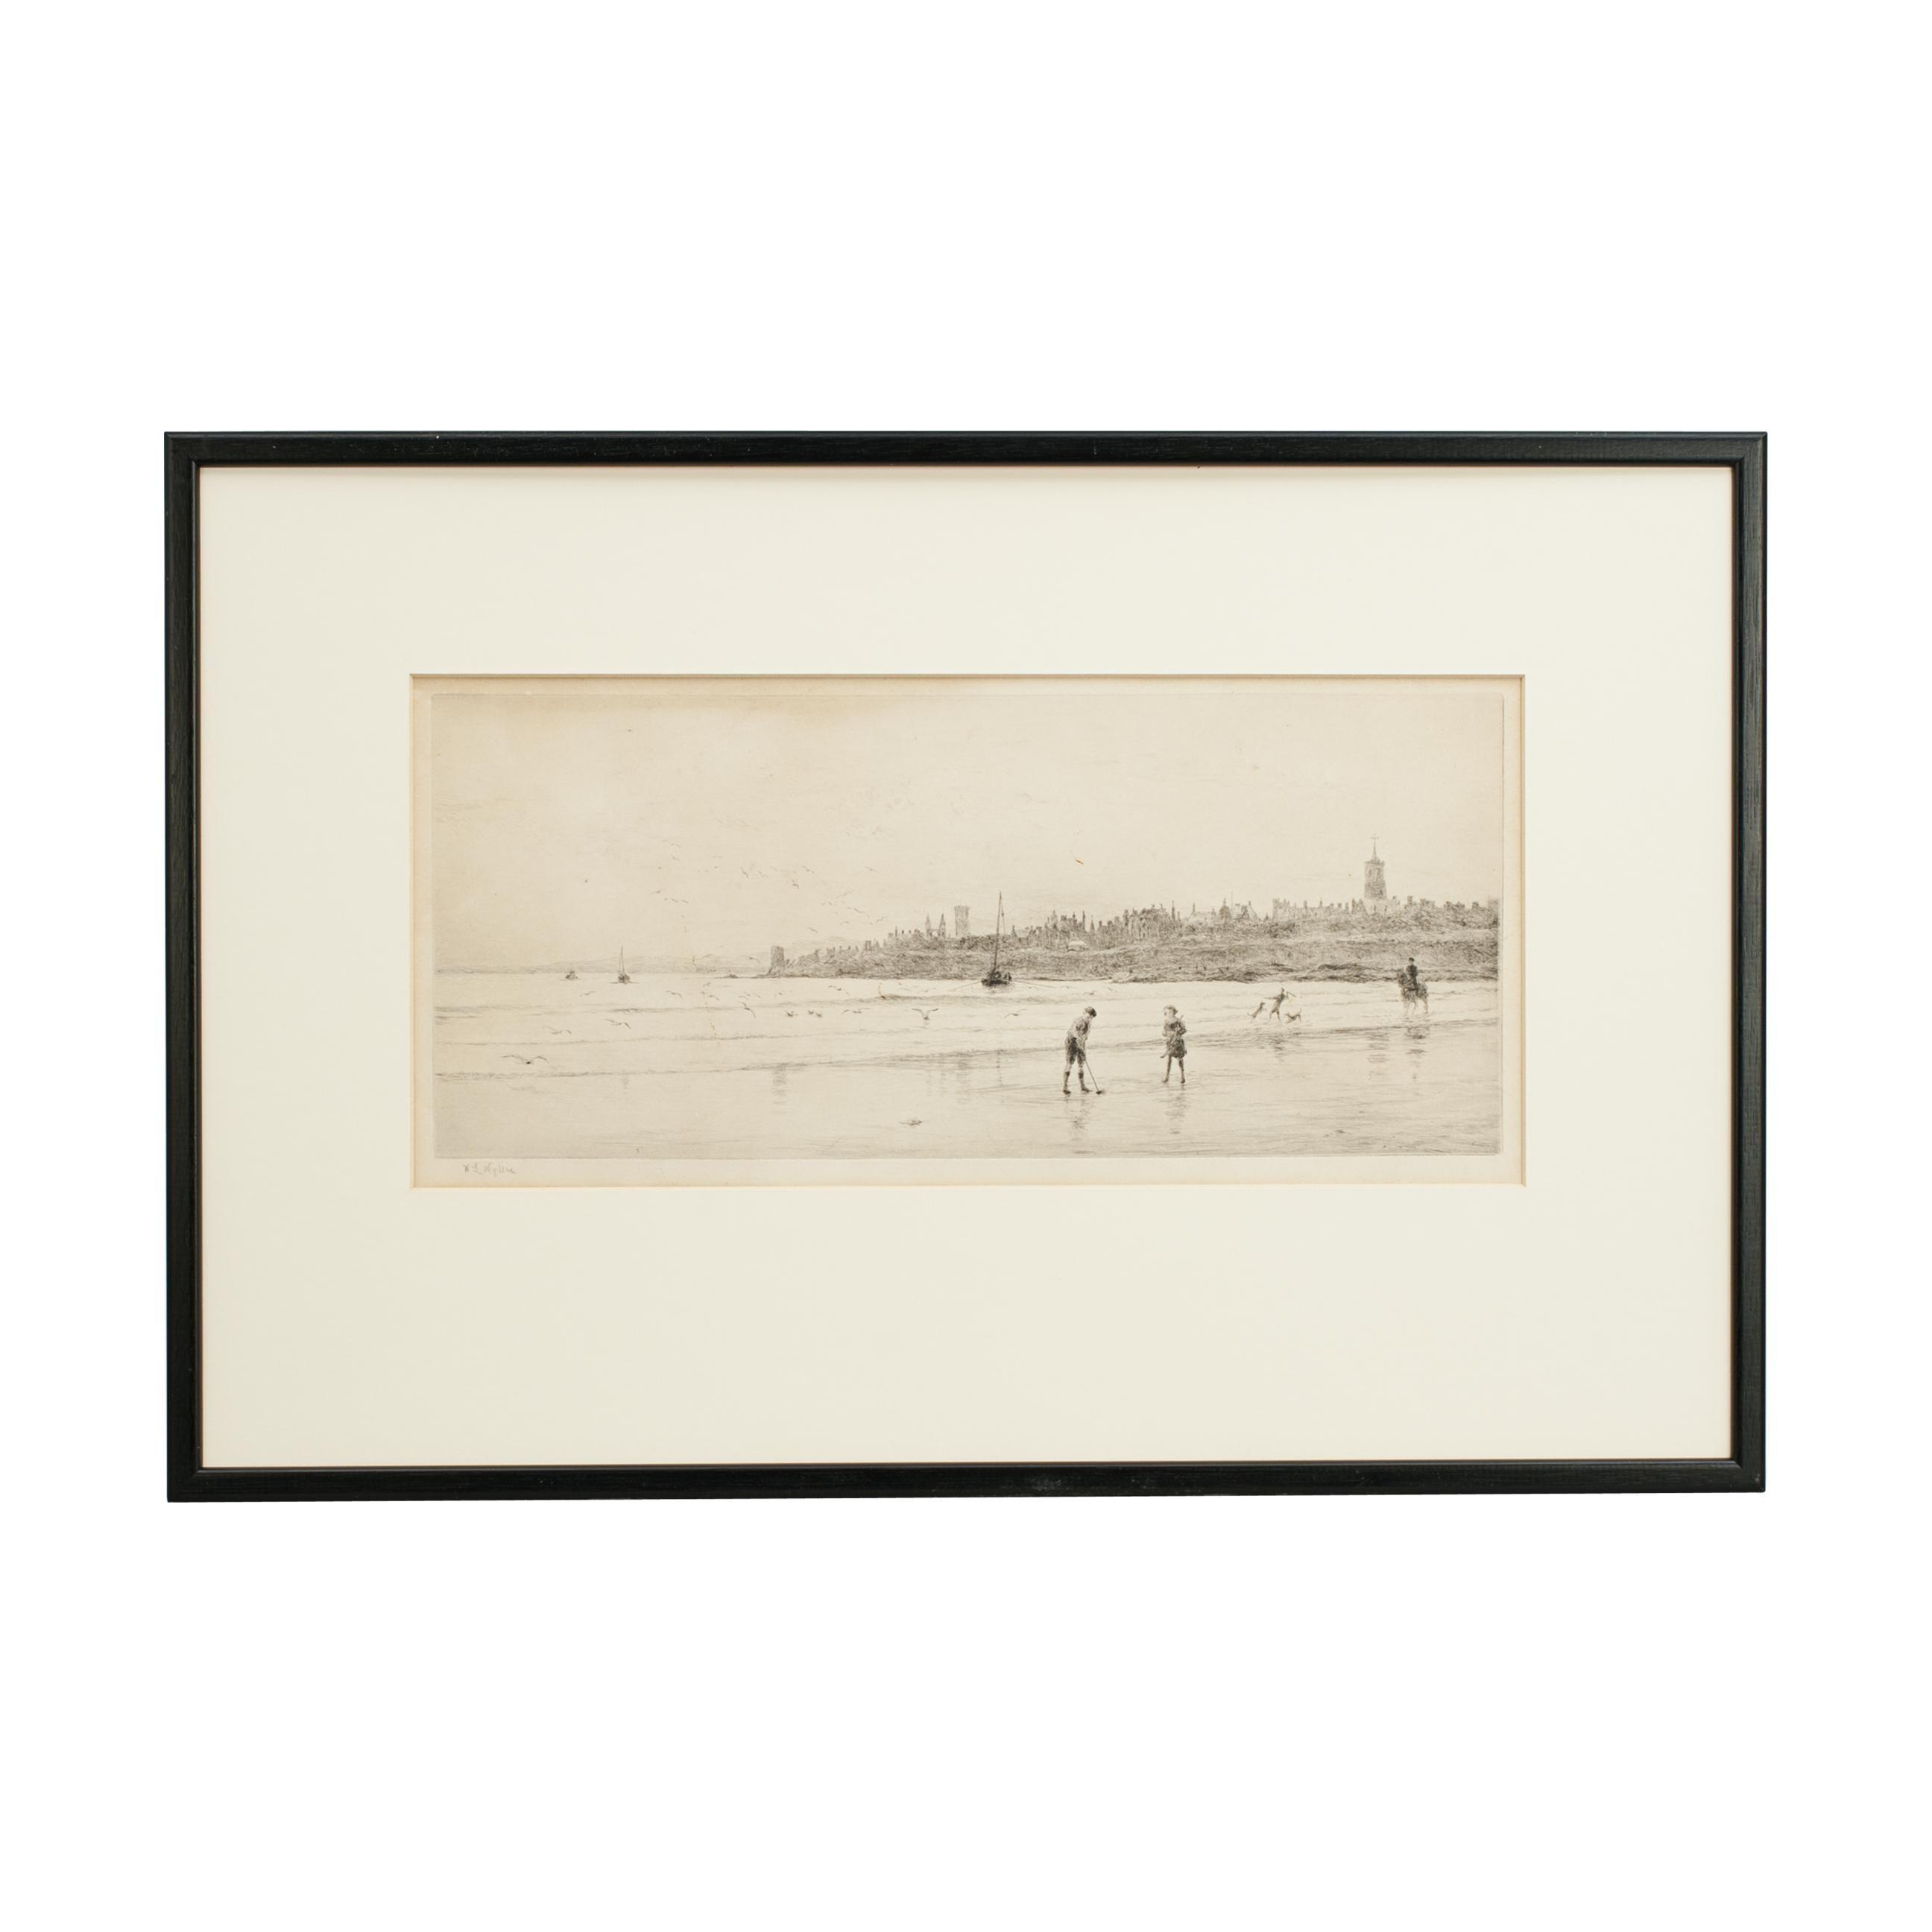 Antique St Andrews Golf Etching by W.L. Wyllie, circa 1900